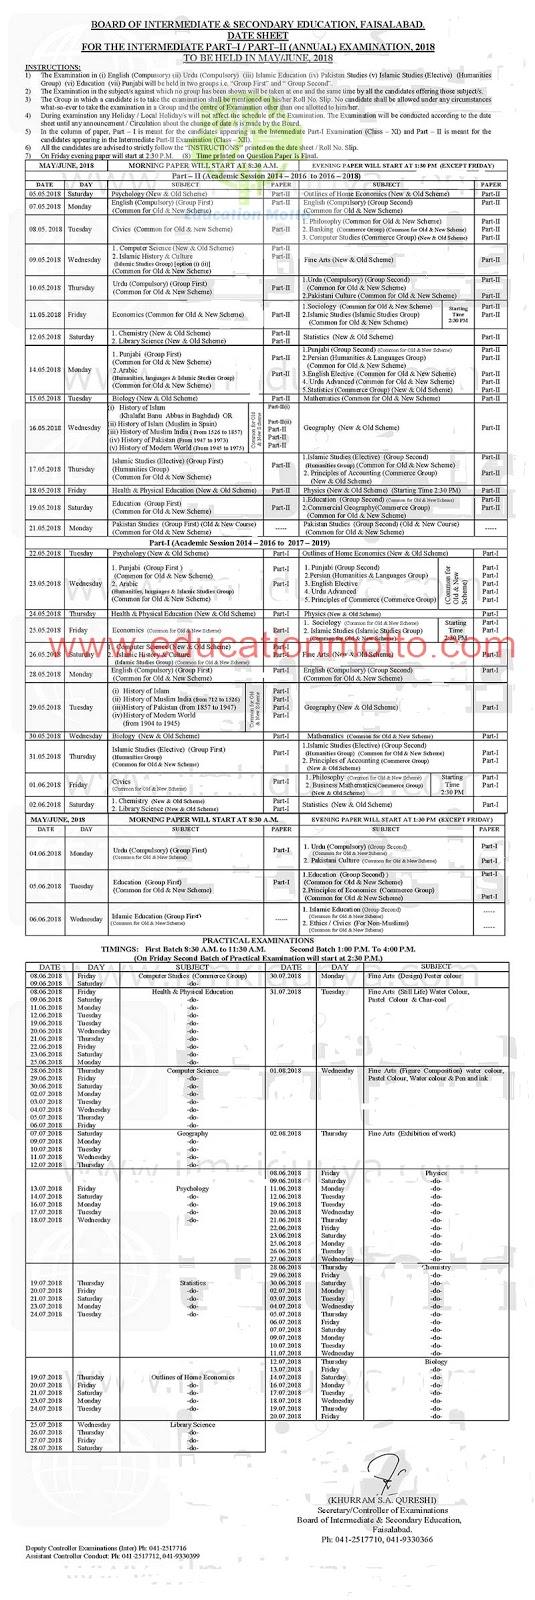 BISE, Faisalabad, Punjab, Pakistan, Date Sheet, Intermediate, HSSC, FA, FSc, Download Part 1, 2 BISE Faisalabad Board Inter Date Sheet, Download FA FSc Date Sheet 2018,